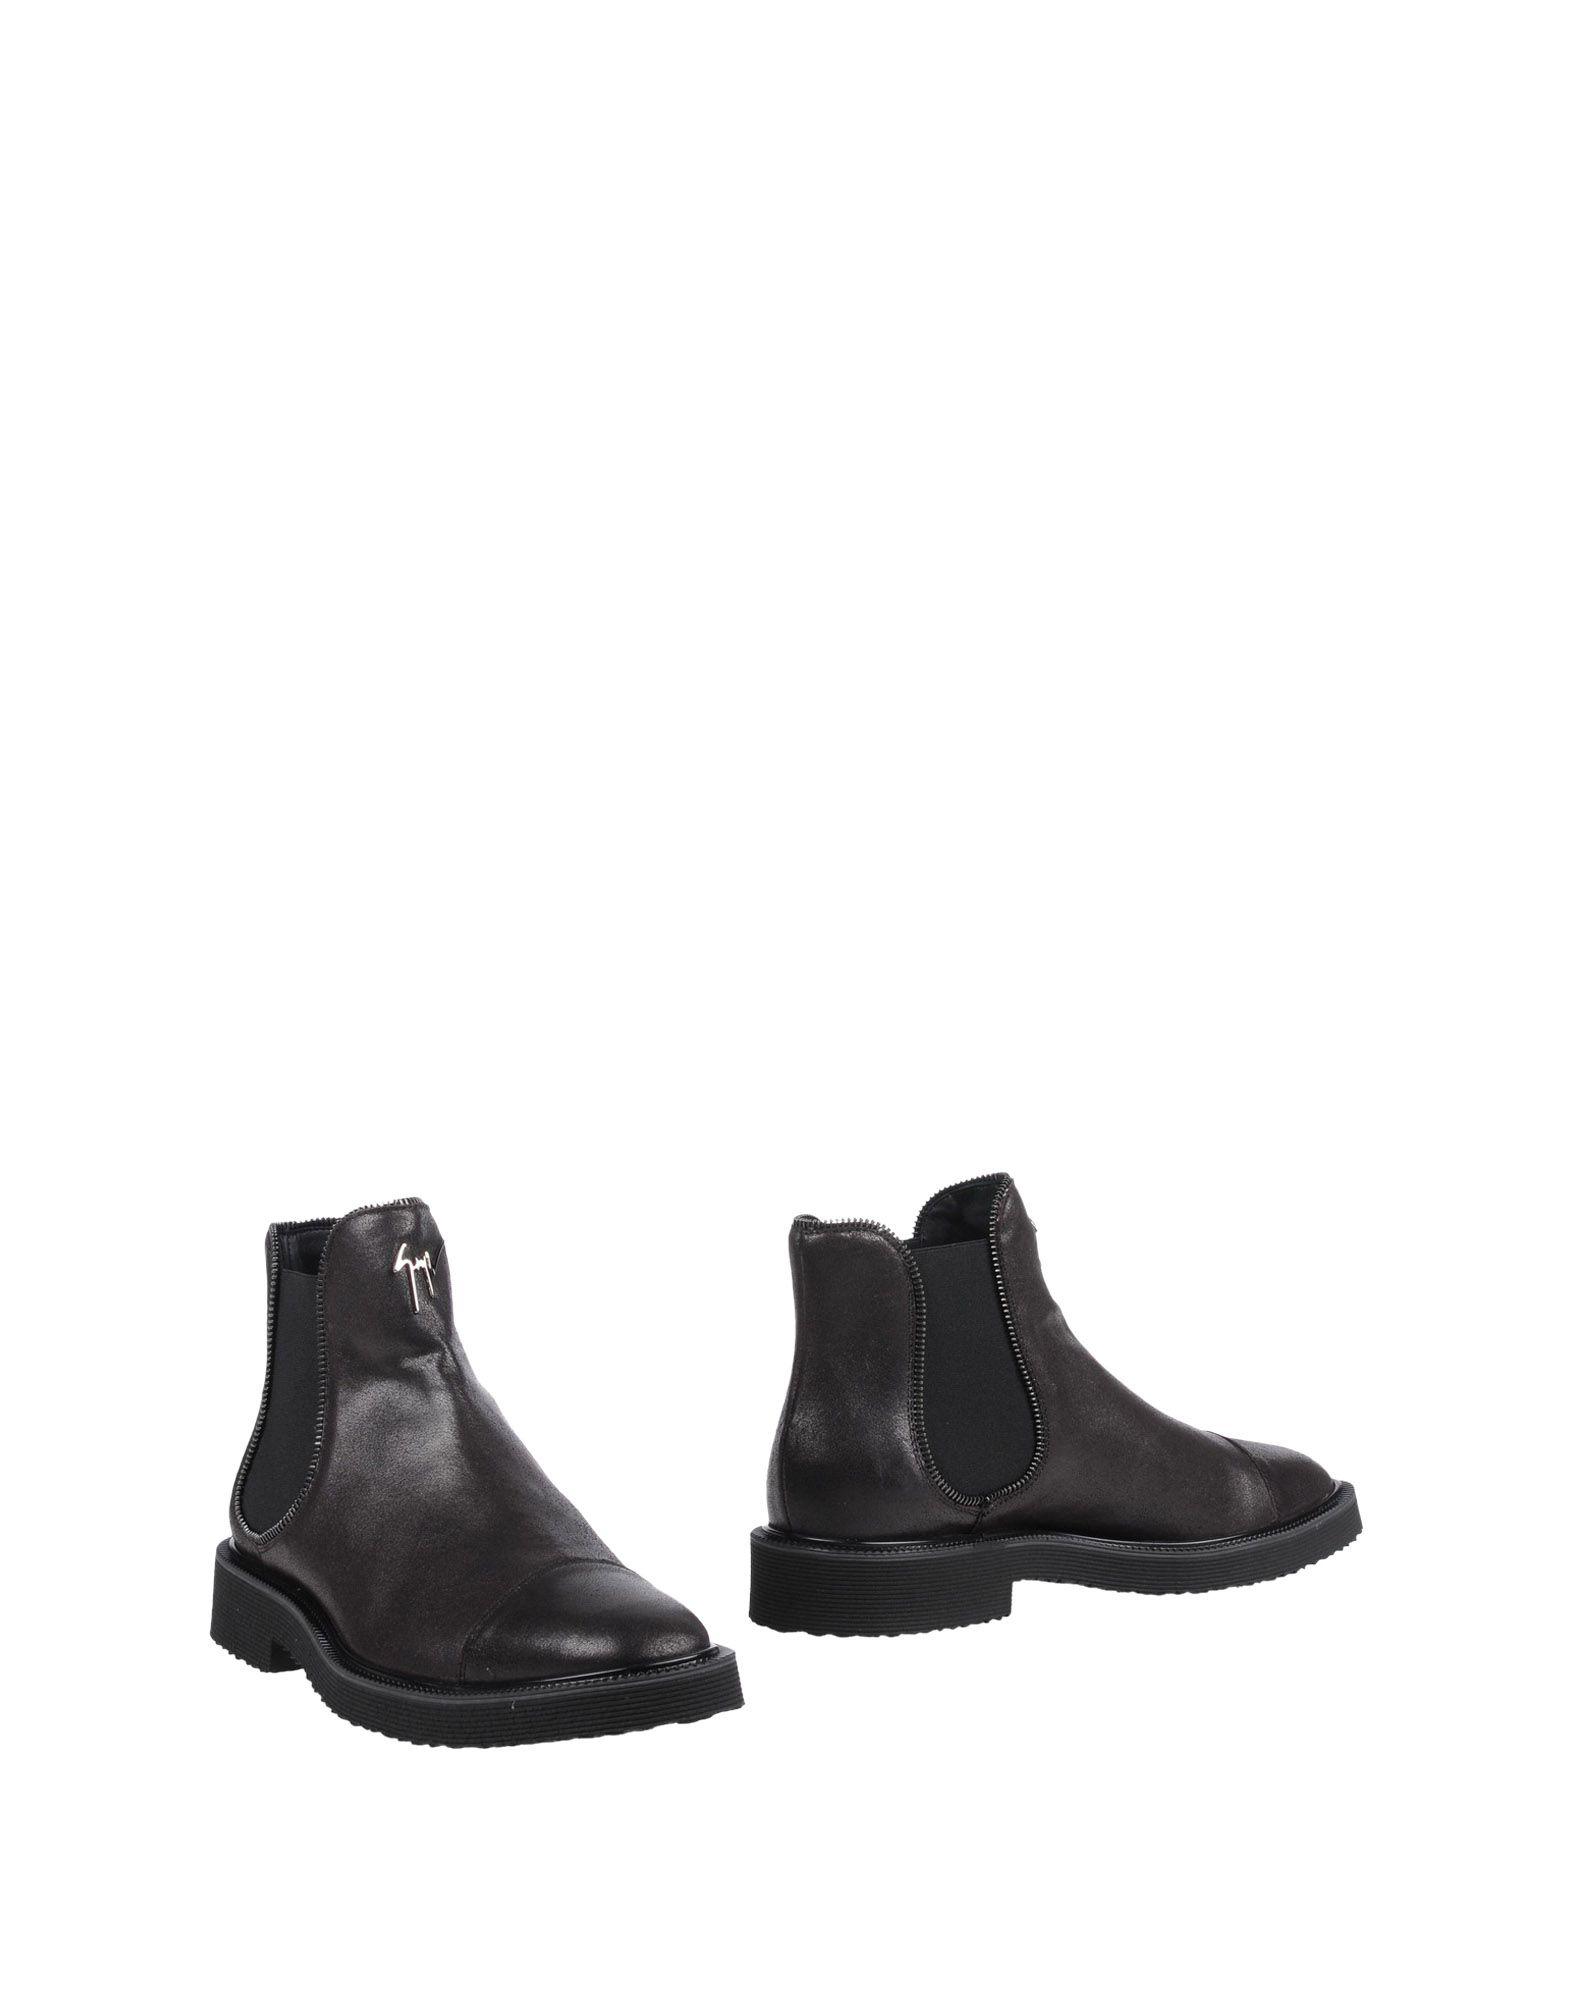 Giuseppe 11446382FO Zanotti Stiefelette Herren  11446382FO Giuseppe Gute Qualität beliebte Schuhe 96463b